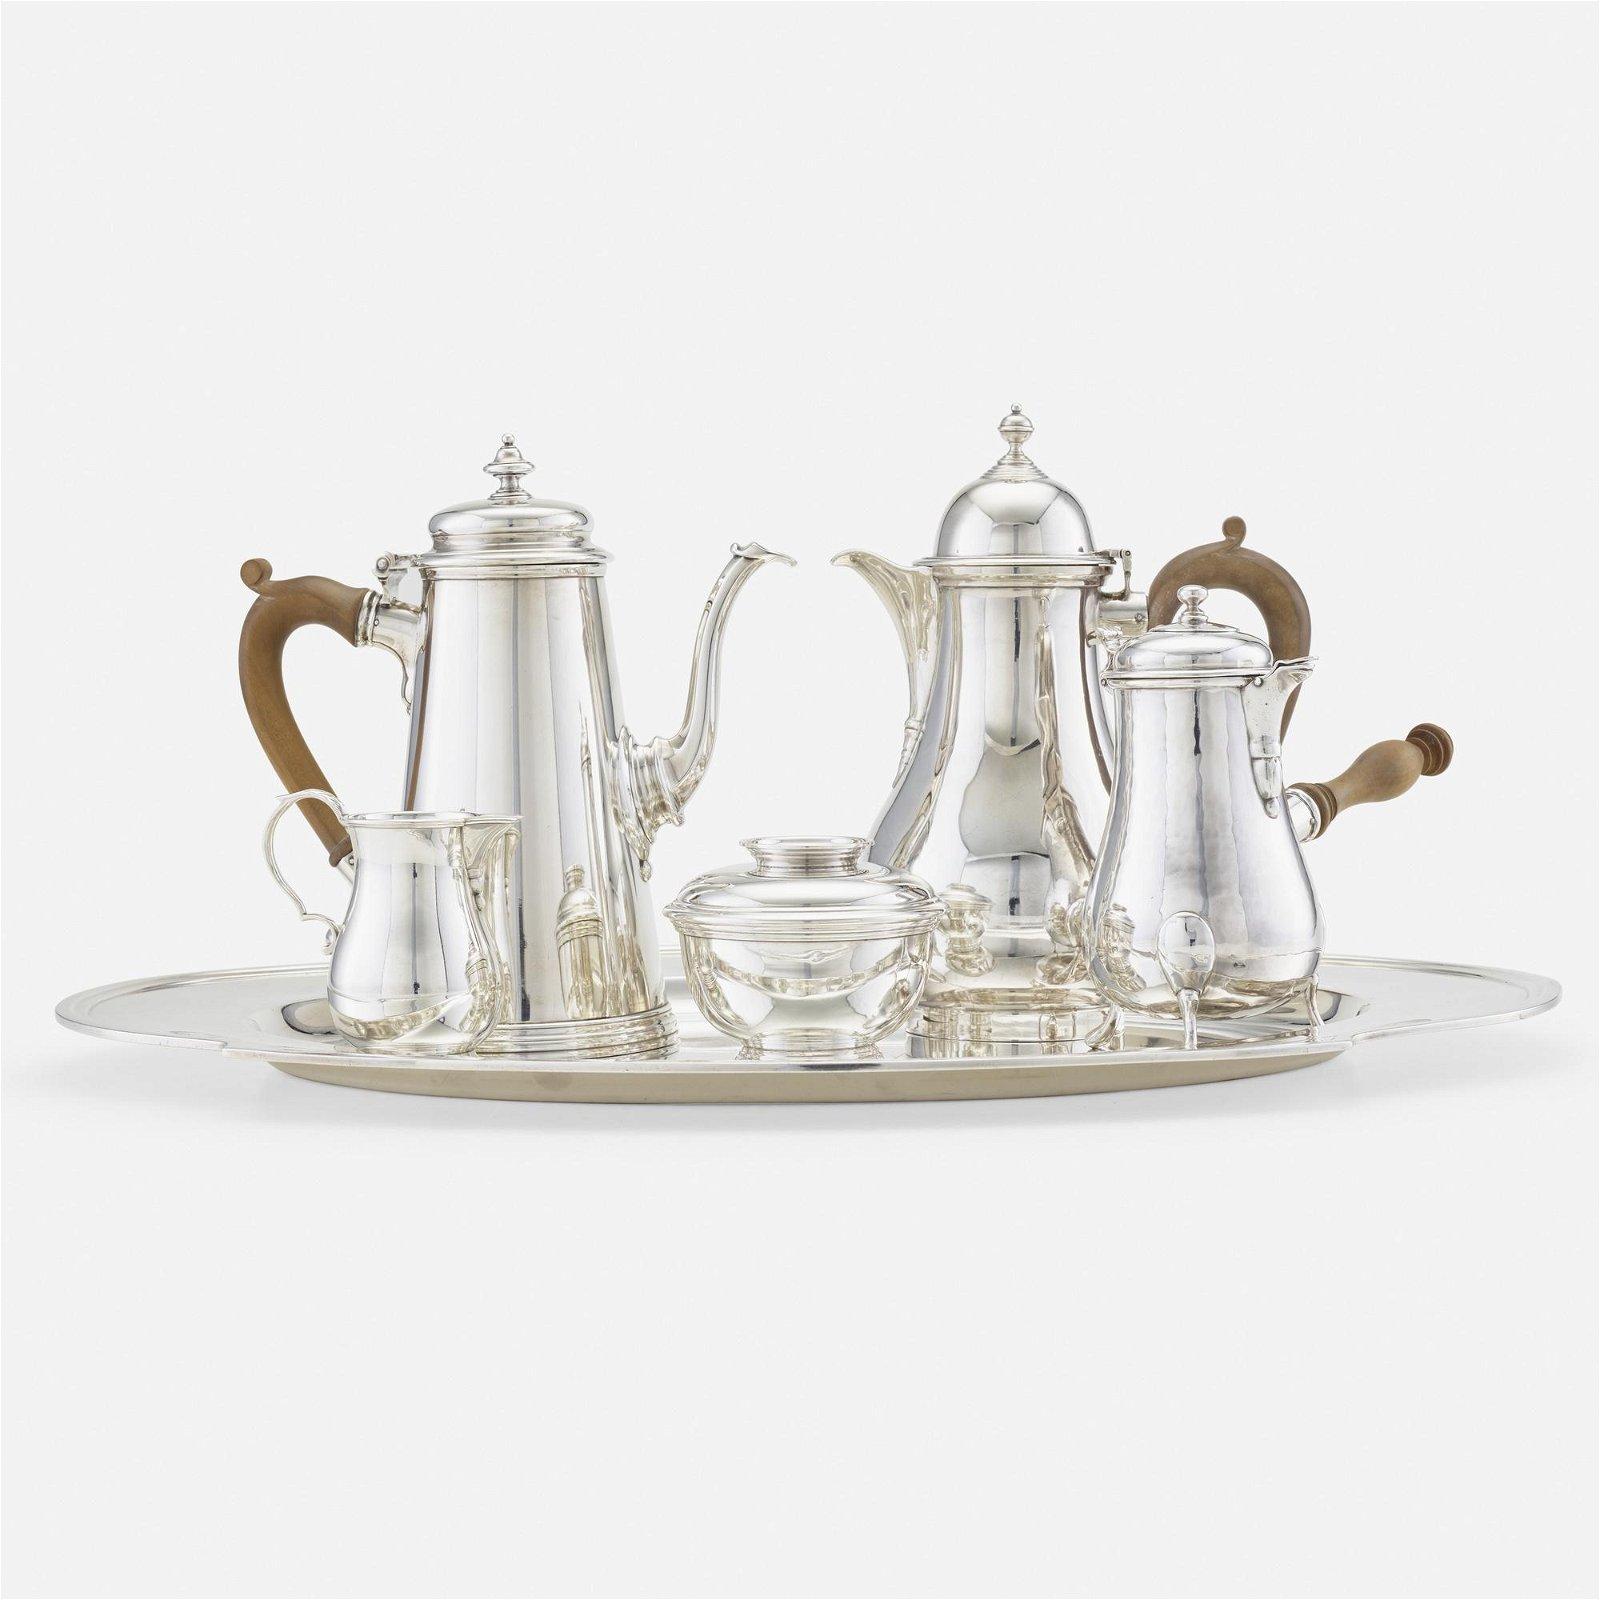 Black, Starr and Gorham, three-piece coffee service